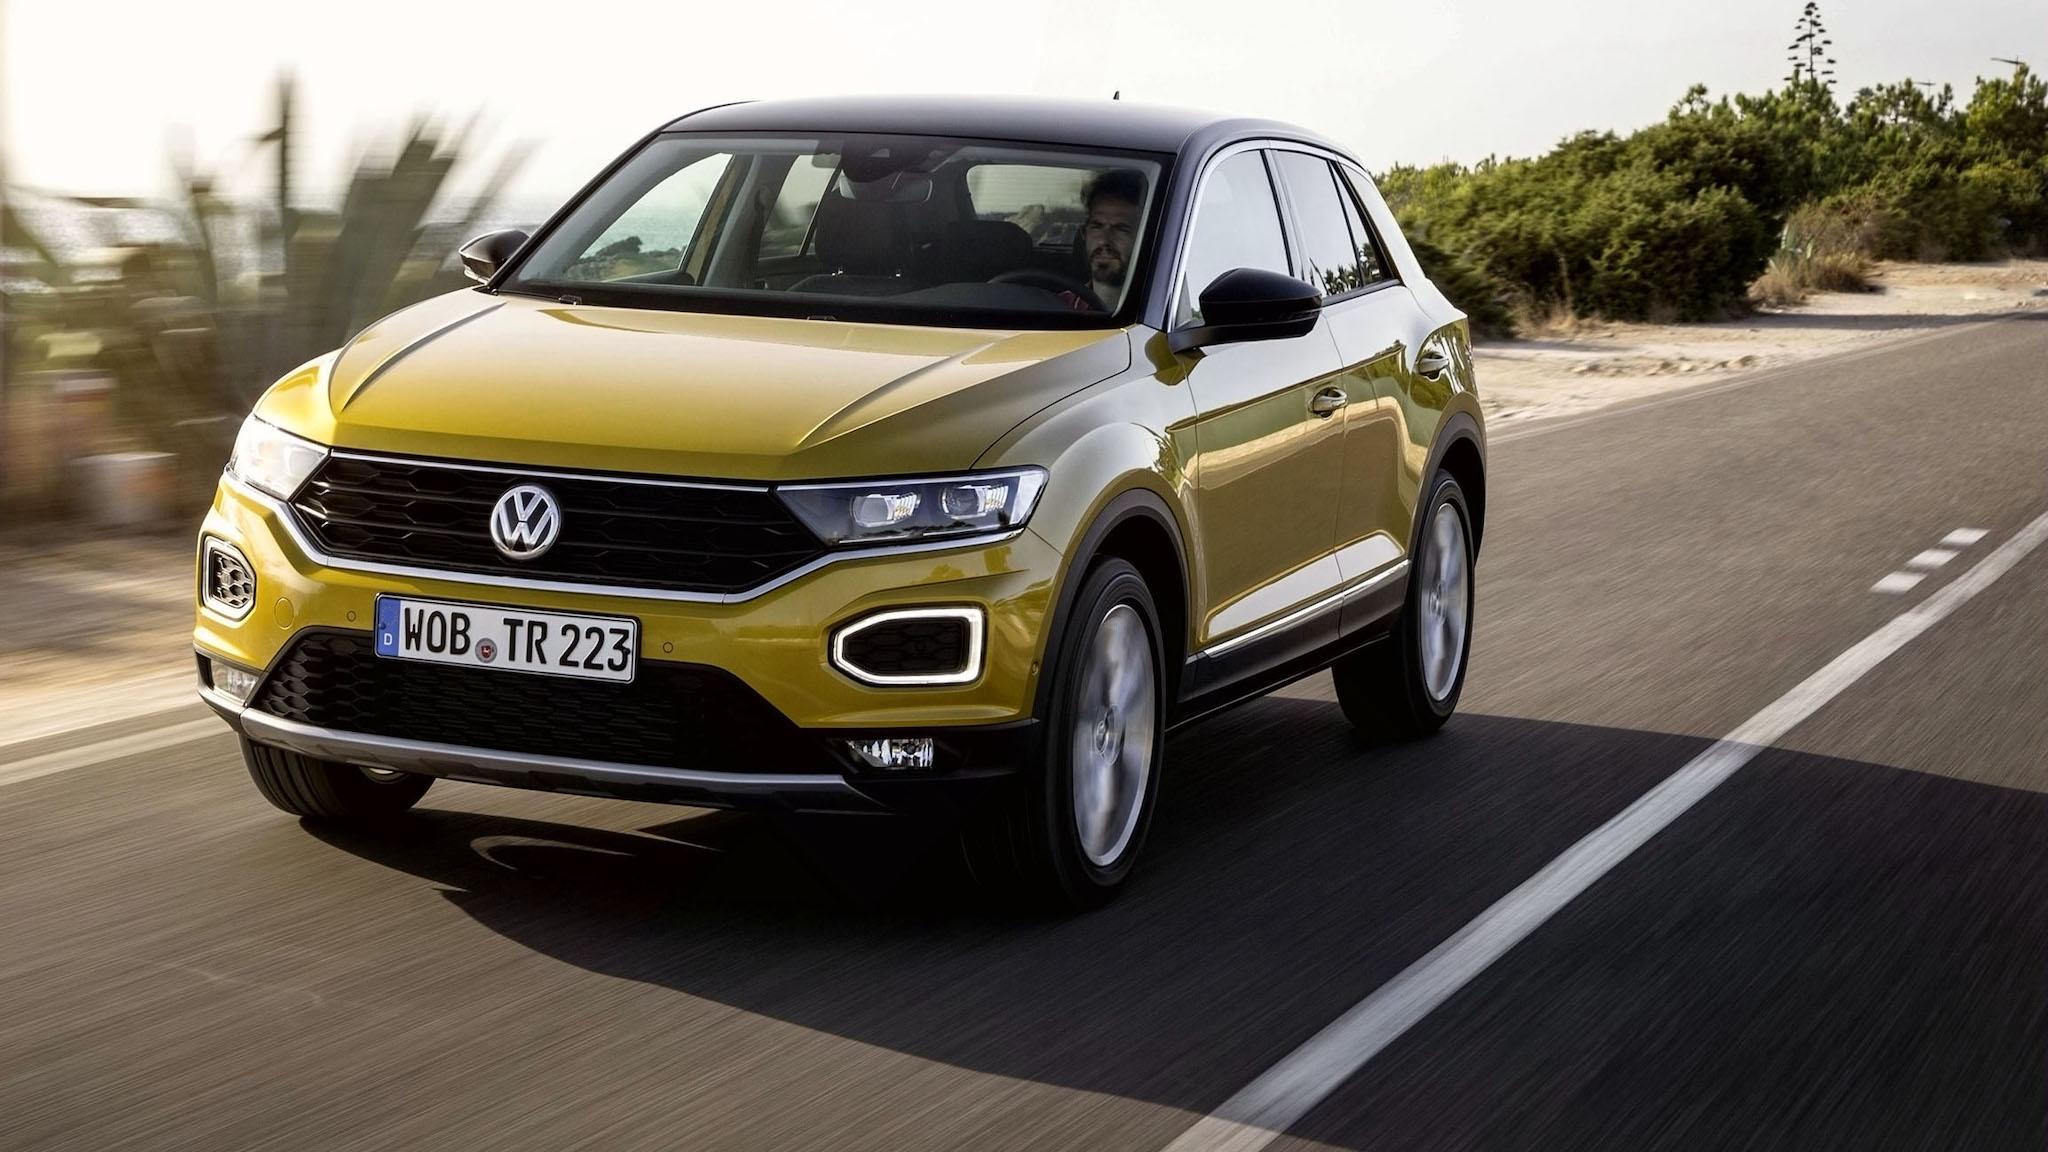 ▲ Volkswagen T-Roc 雙十連假展開巡迴,預售 112.8 萬元起持續接單中